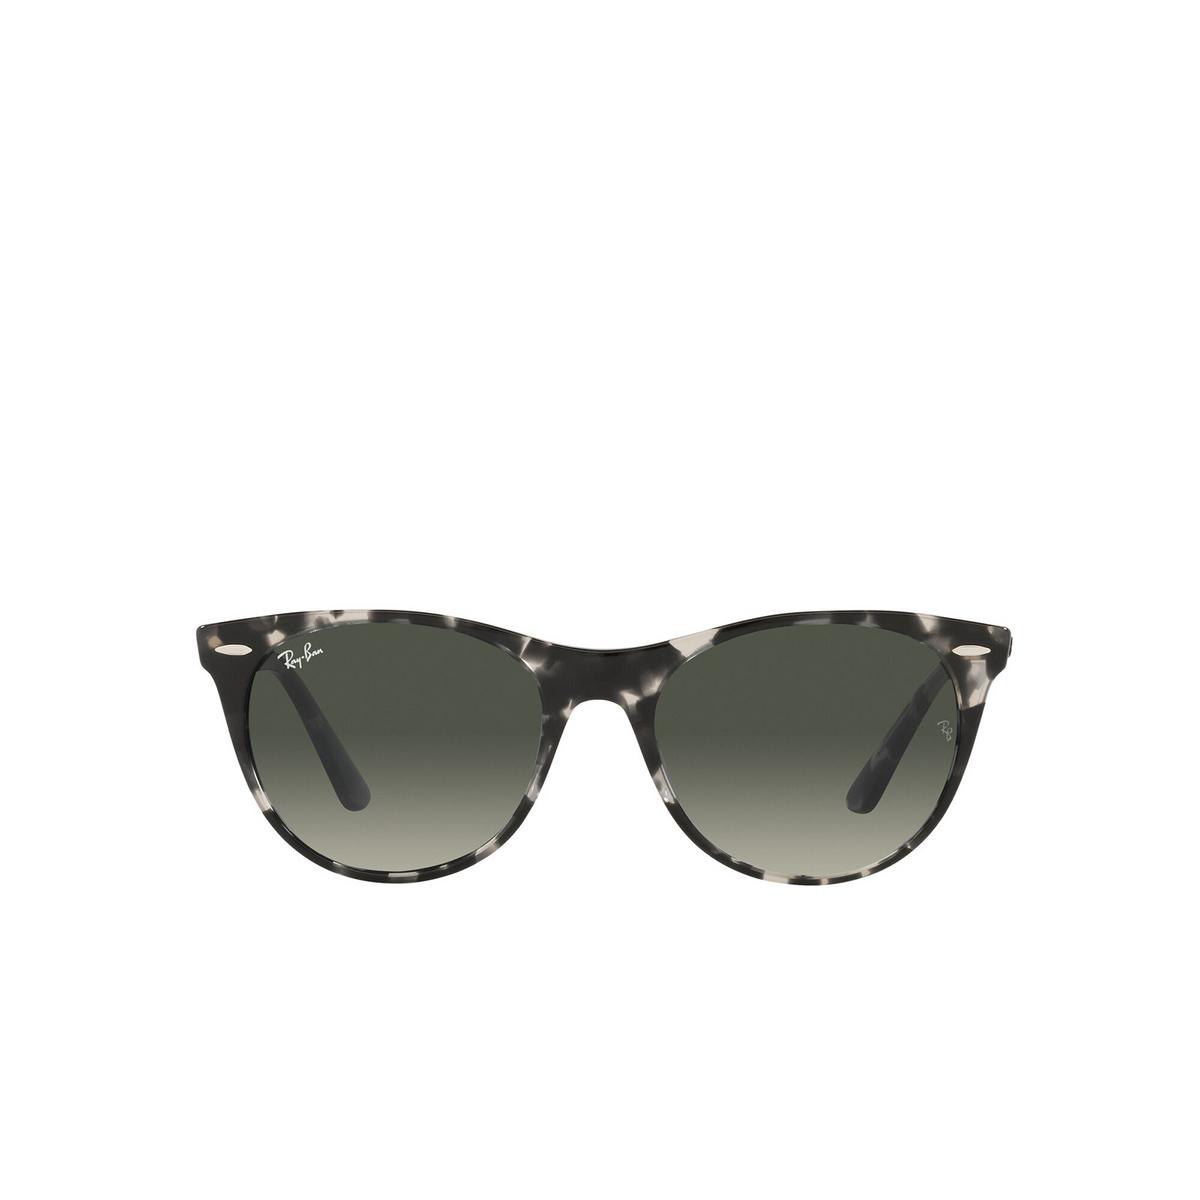 Ray-Ban® Round Sunglasses: Wayfarer Ii RB2185 color Gray Havana 133371 - front view.